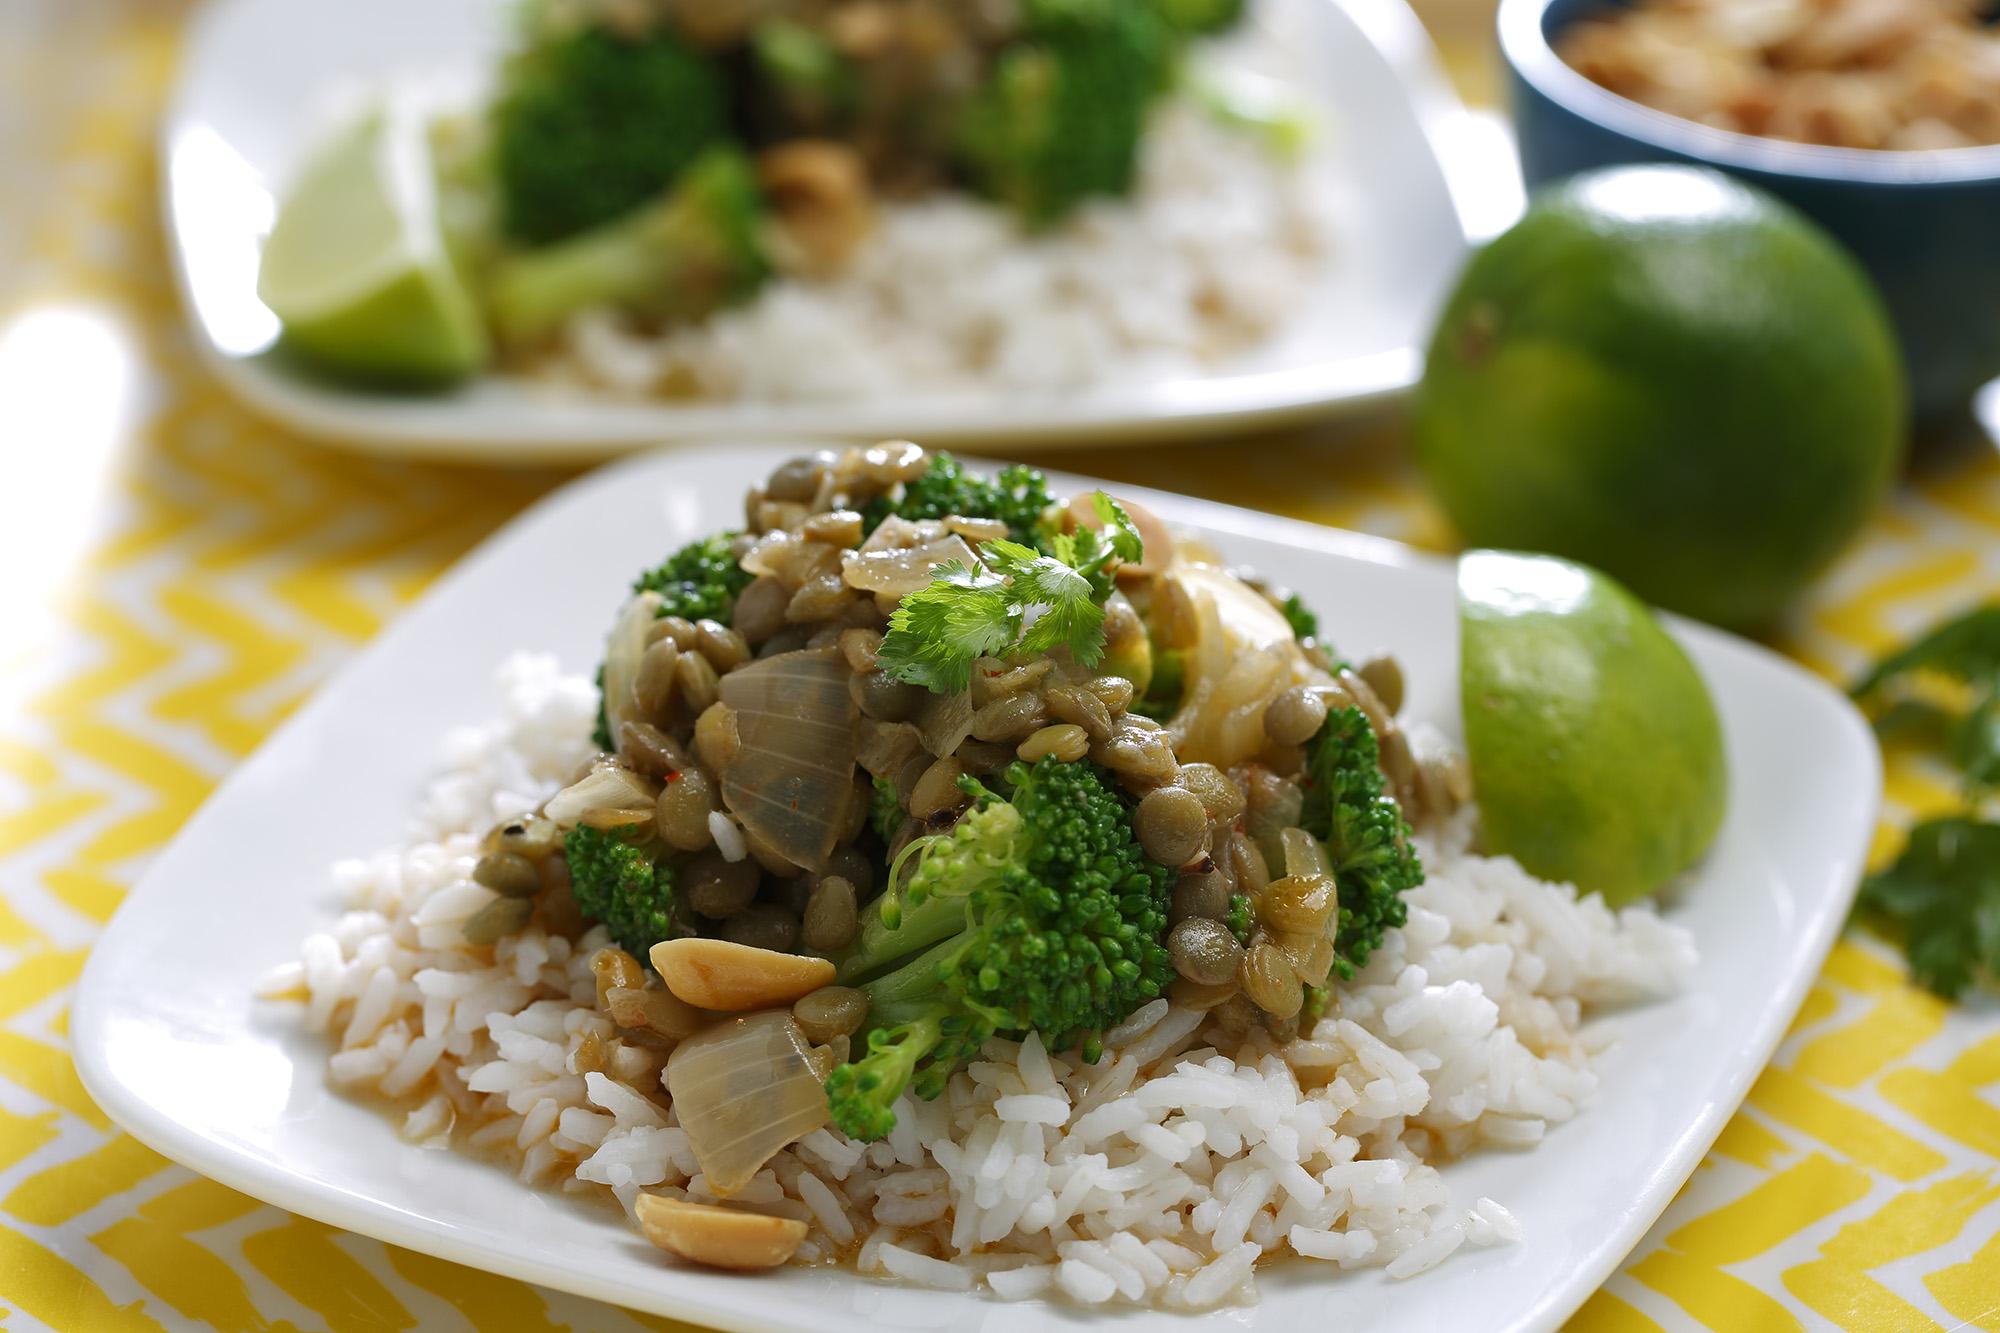 Lentil Amp Broccoli Curry With Coconut Milk Lentils Org